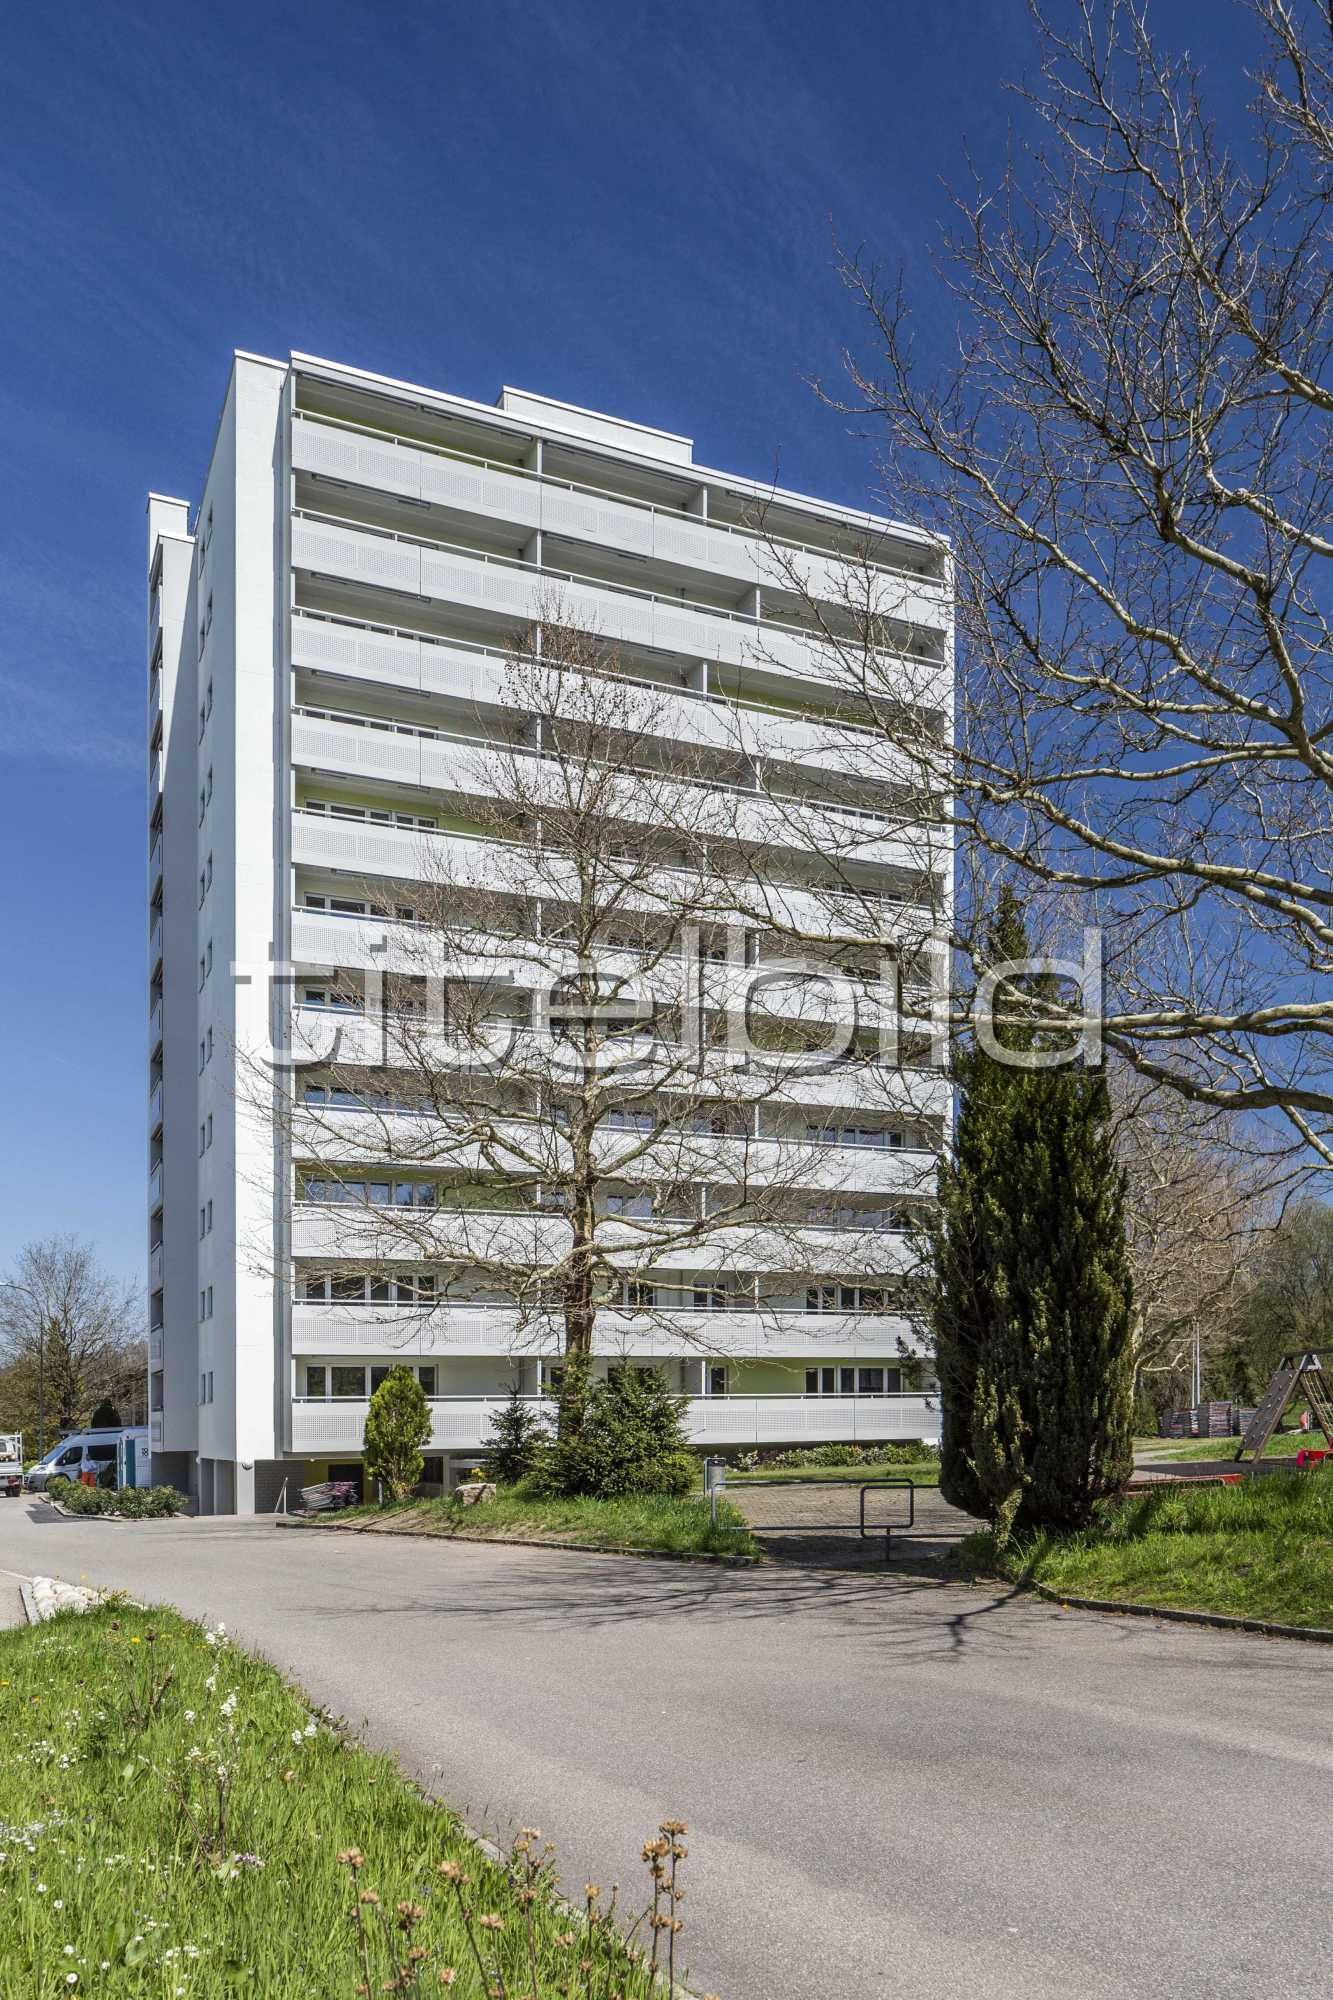 Projektbild-Nr. 7: Waldhofstrasse 54